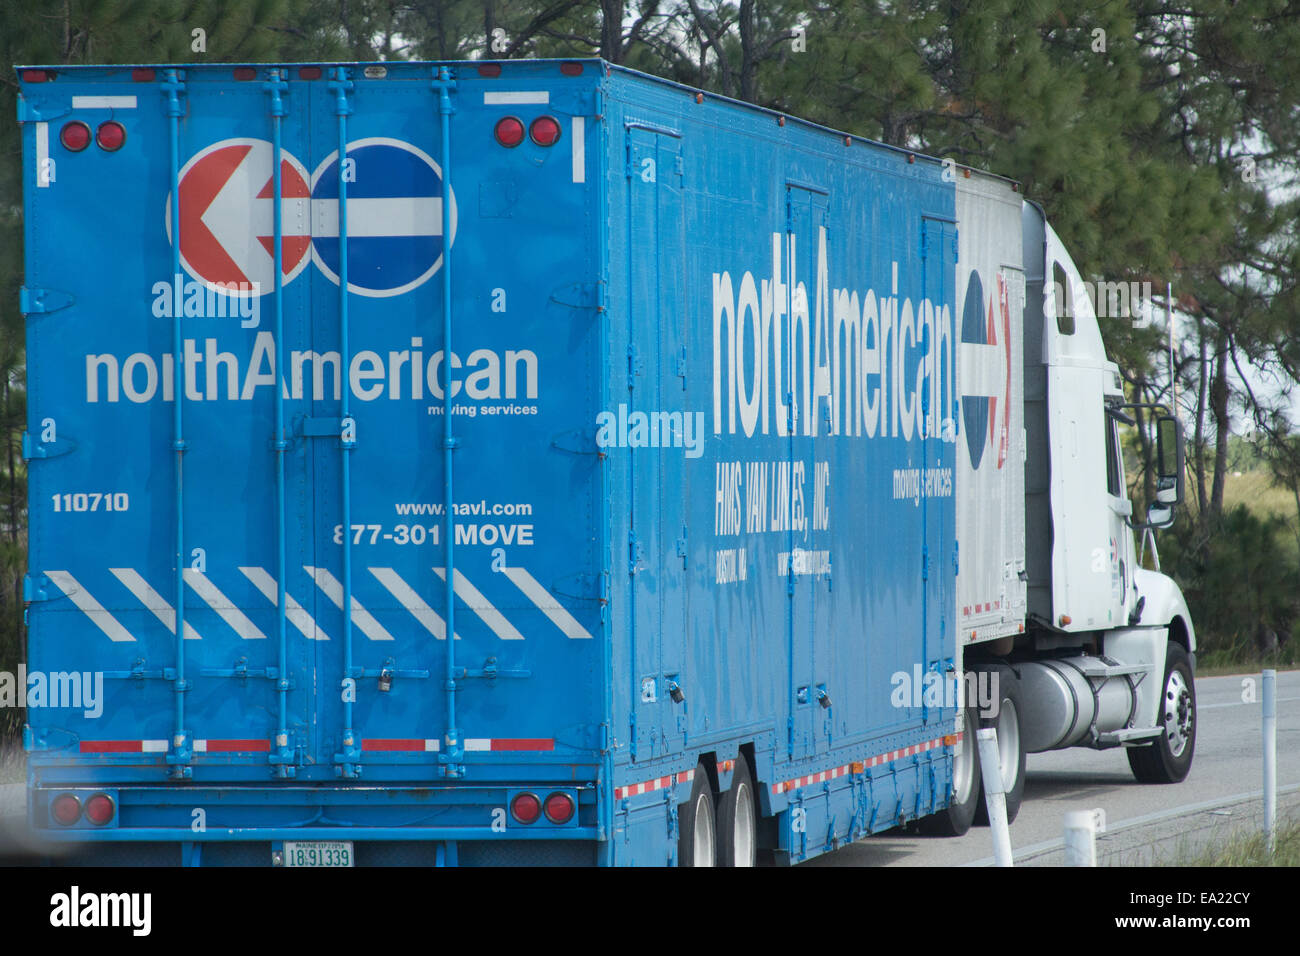 North American Moving >> A North American Moving Services Truck Stock Photo 75033867 Alamy